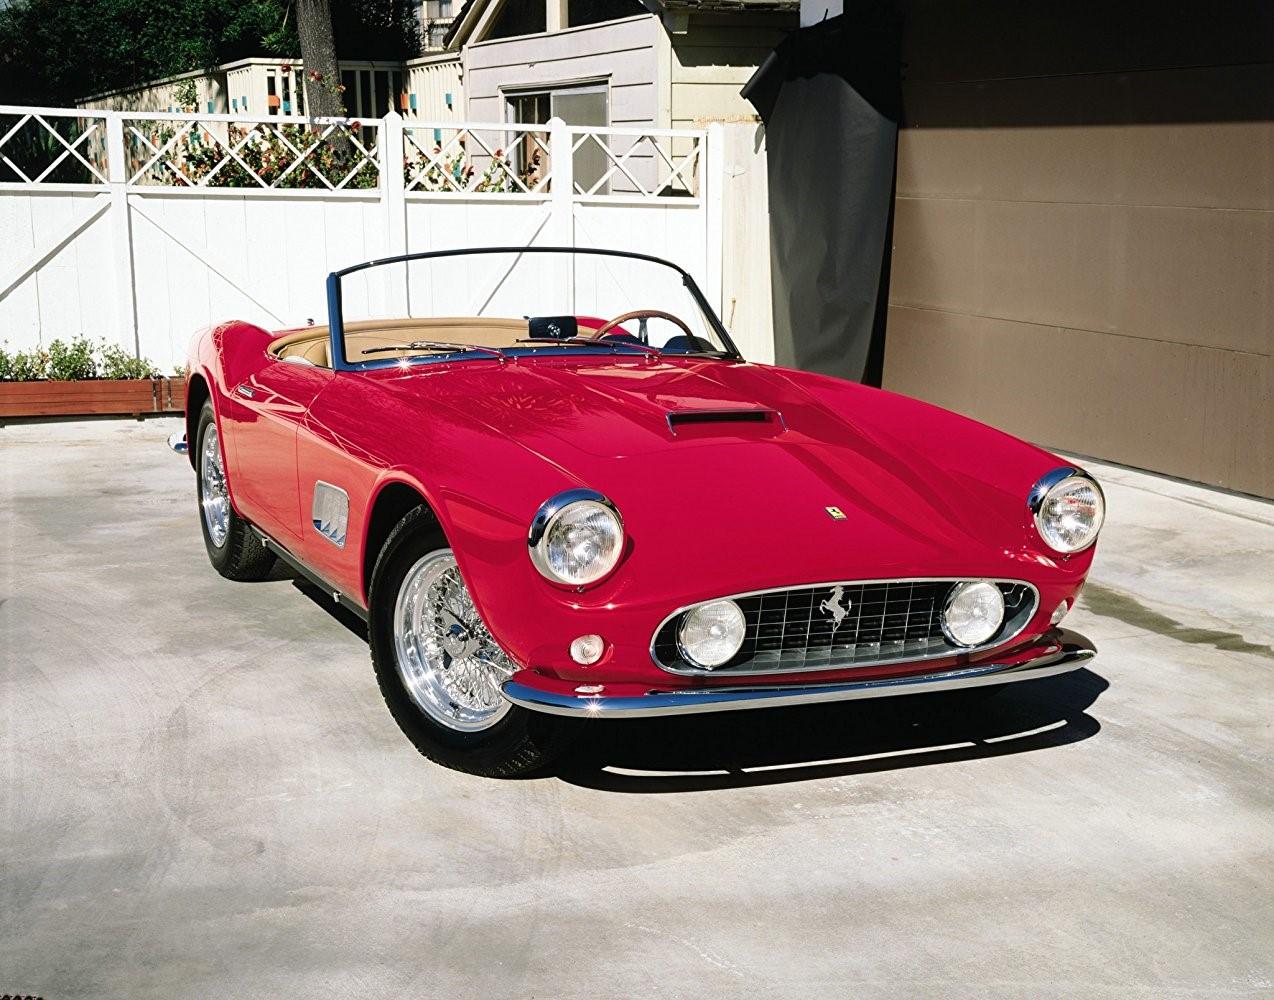 Ferris Buellers Ferrari 250GT